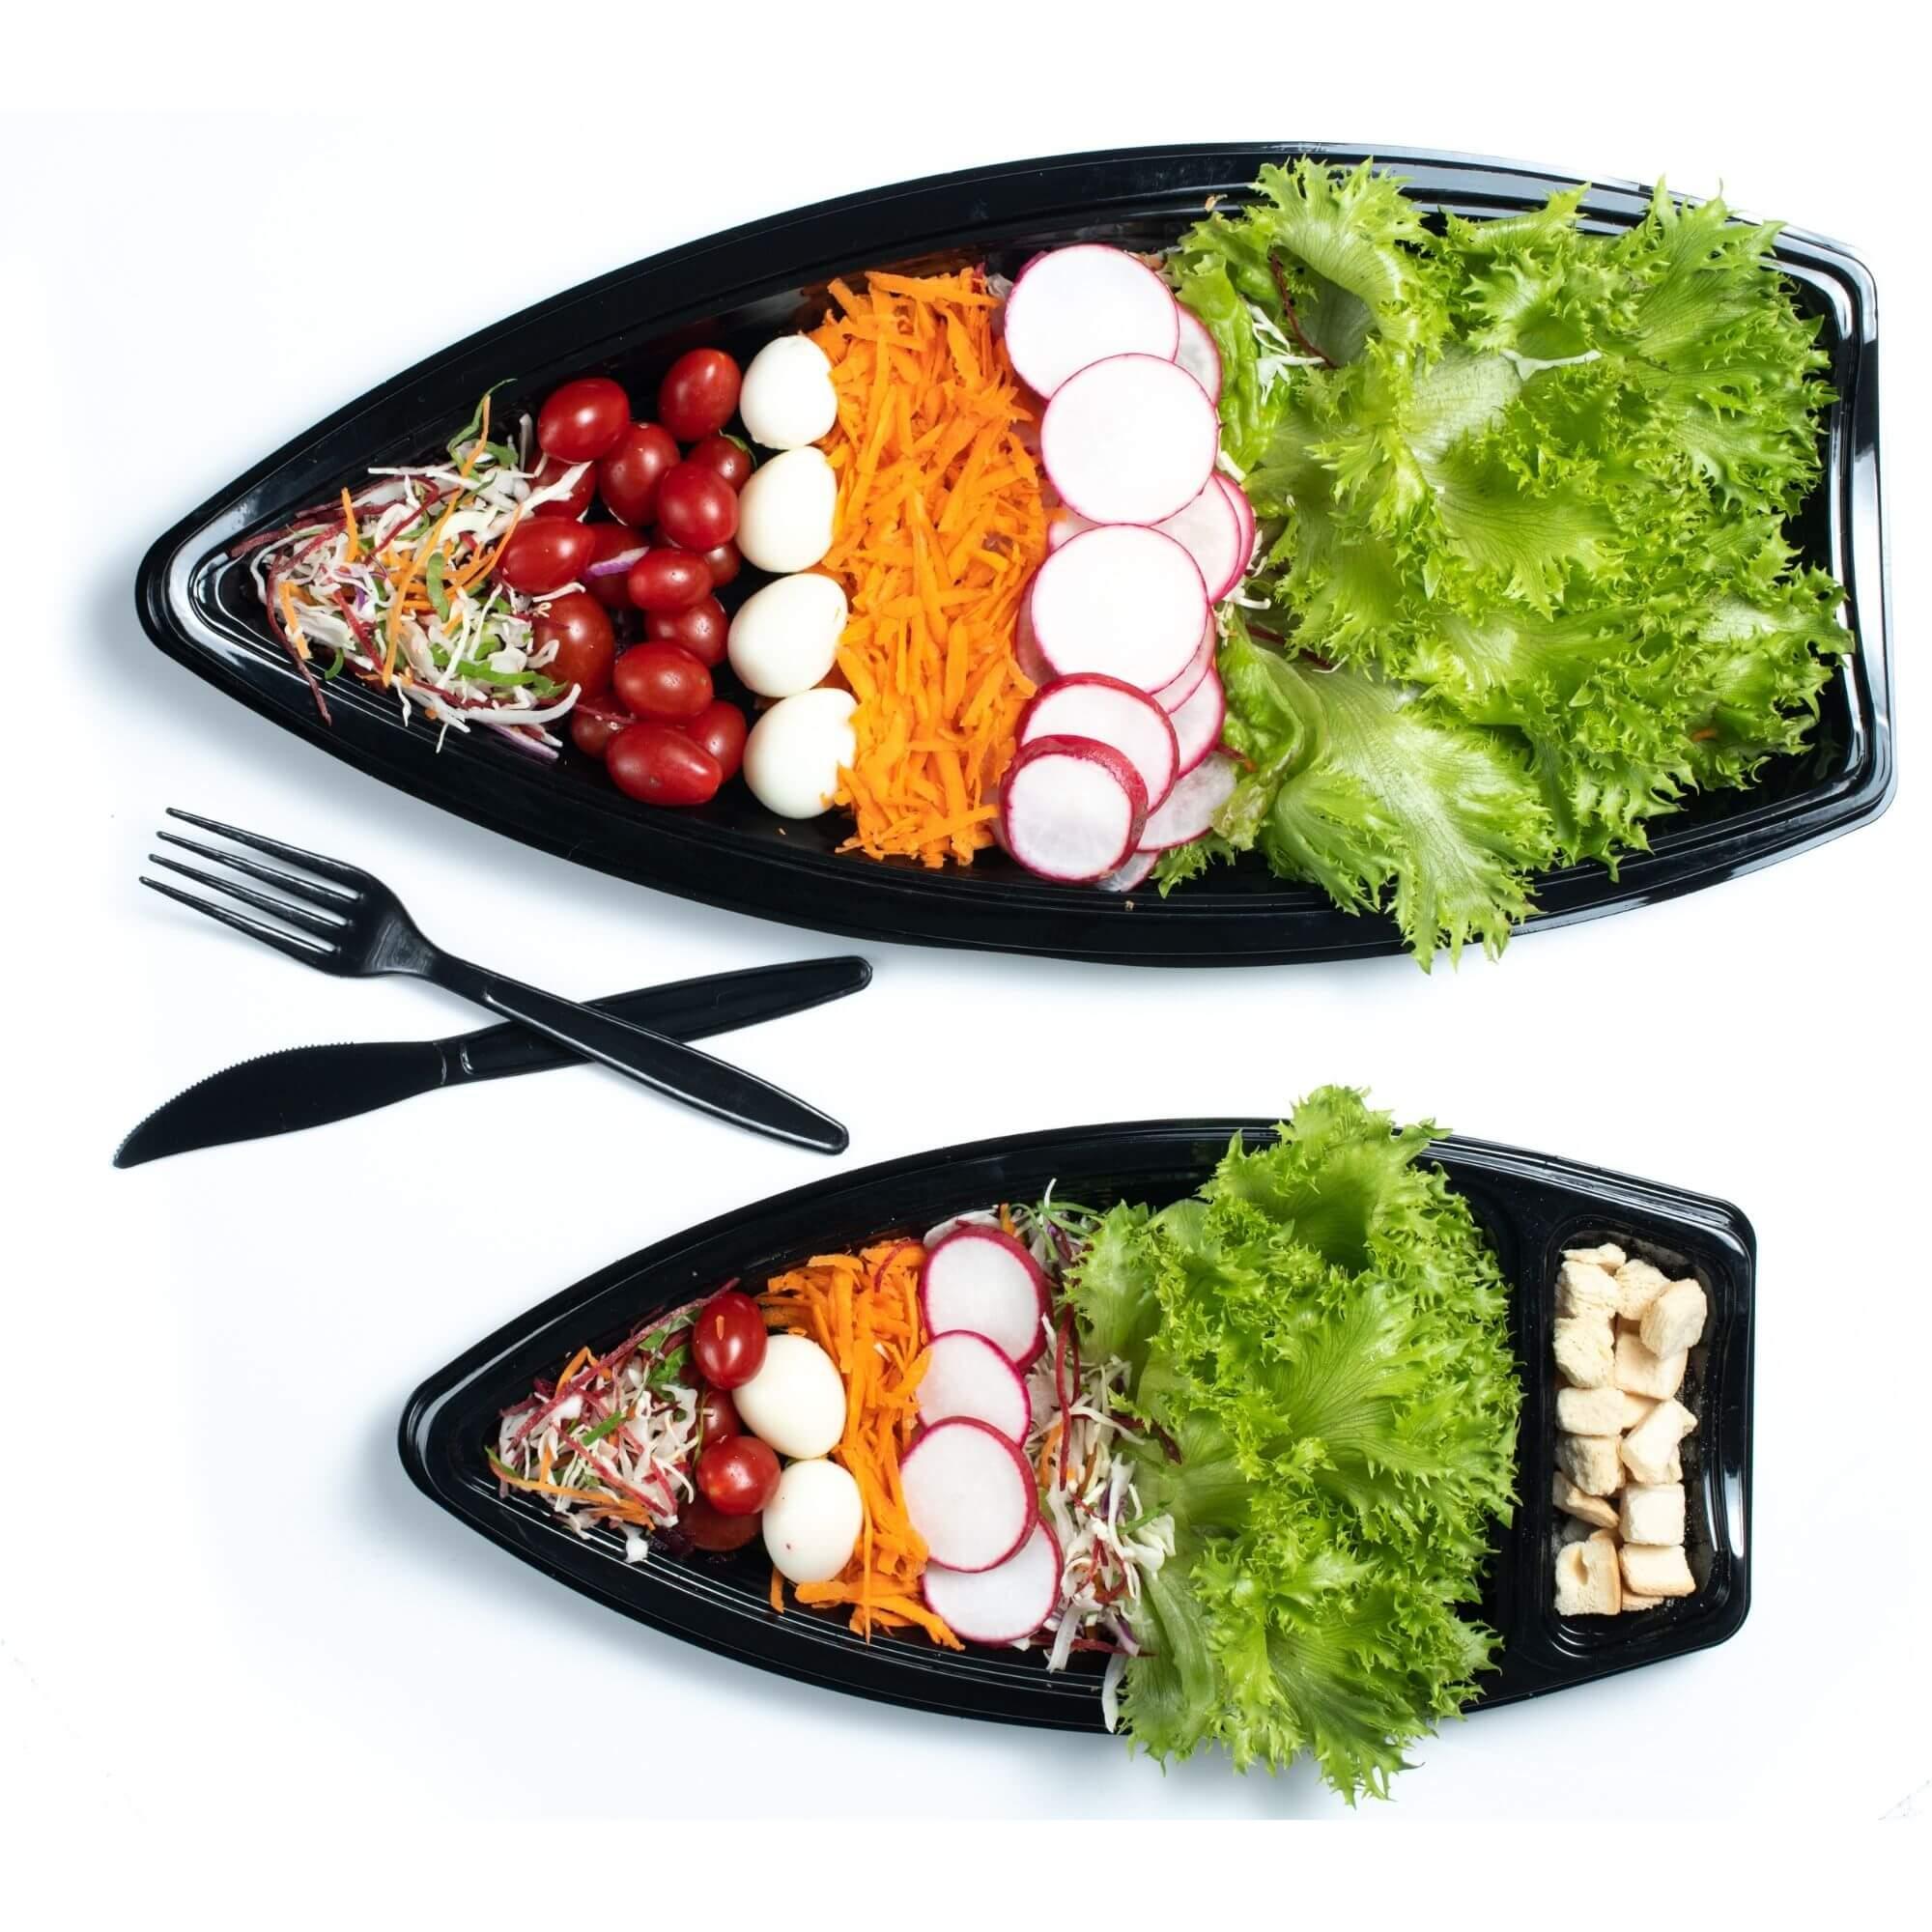 Embalagem barca comida japonesa - Galvanotek GO930 GO935 GO933